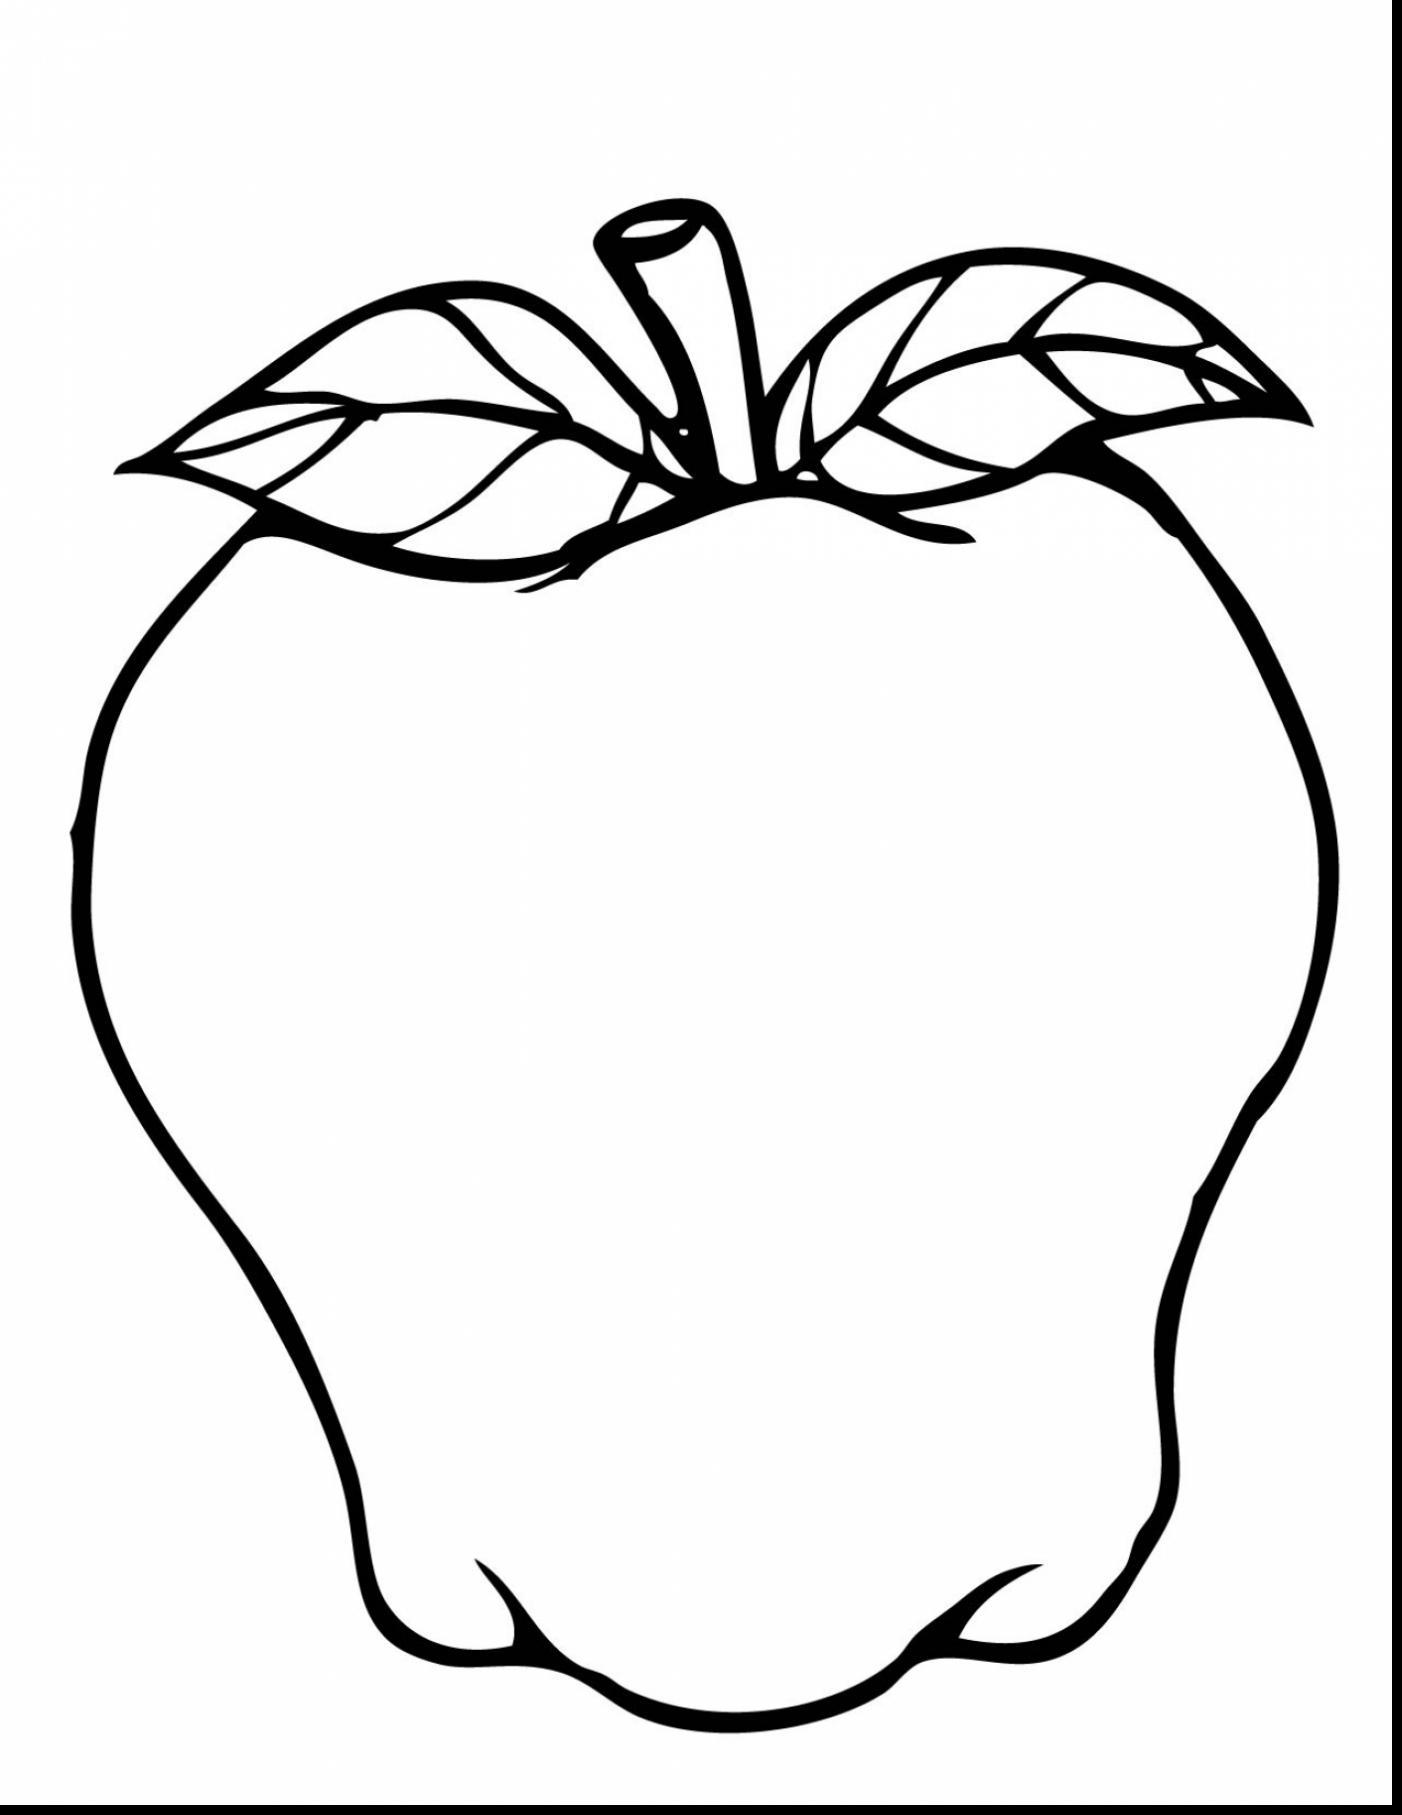 Apple Tree Outline Printable